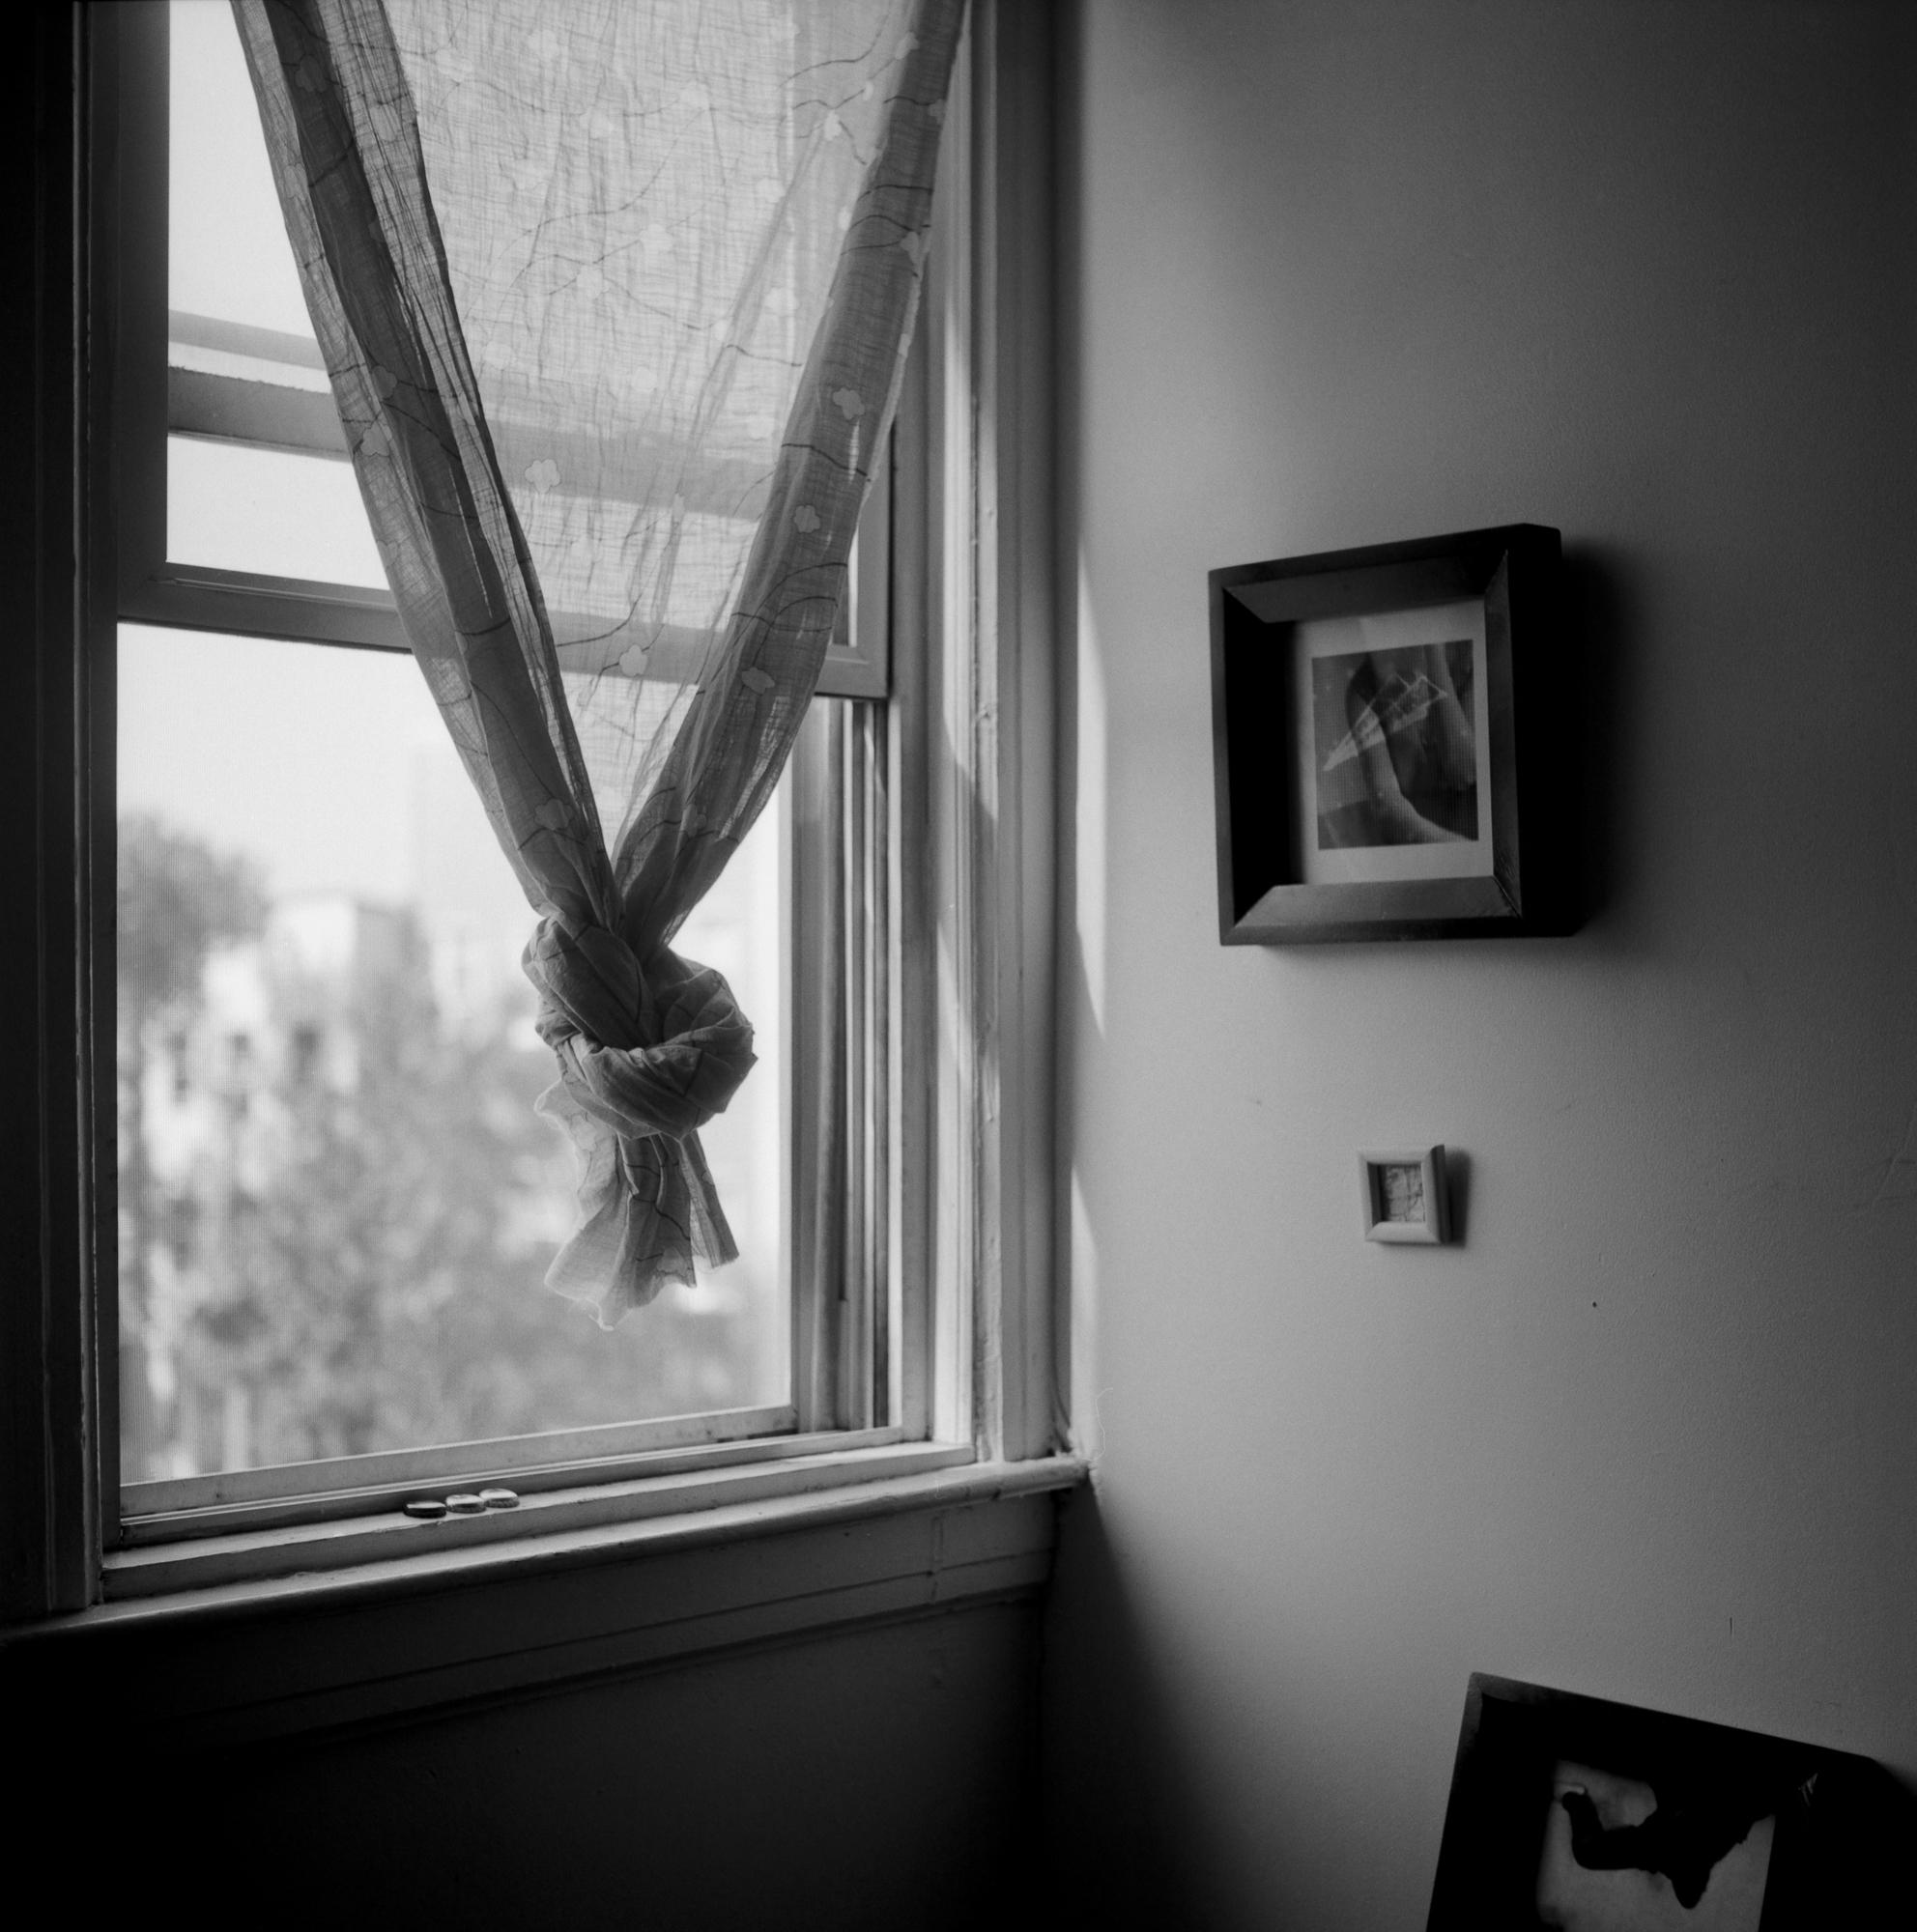 645-apt-window-02a.jpg